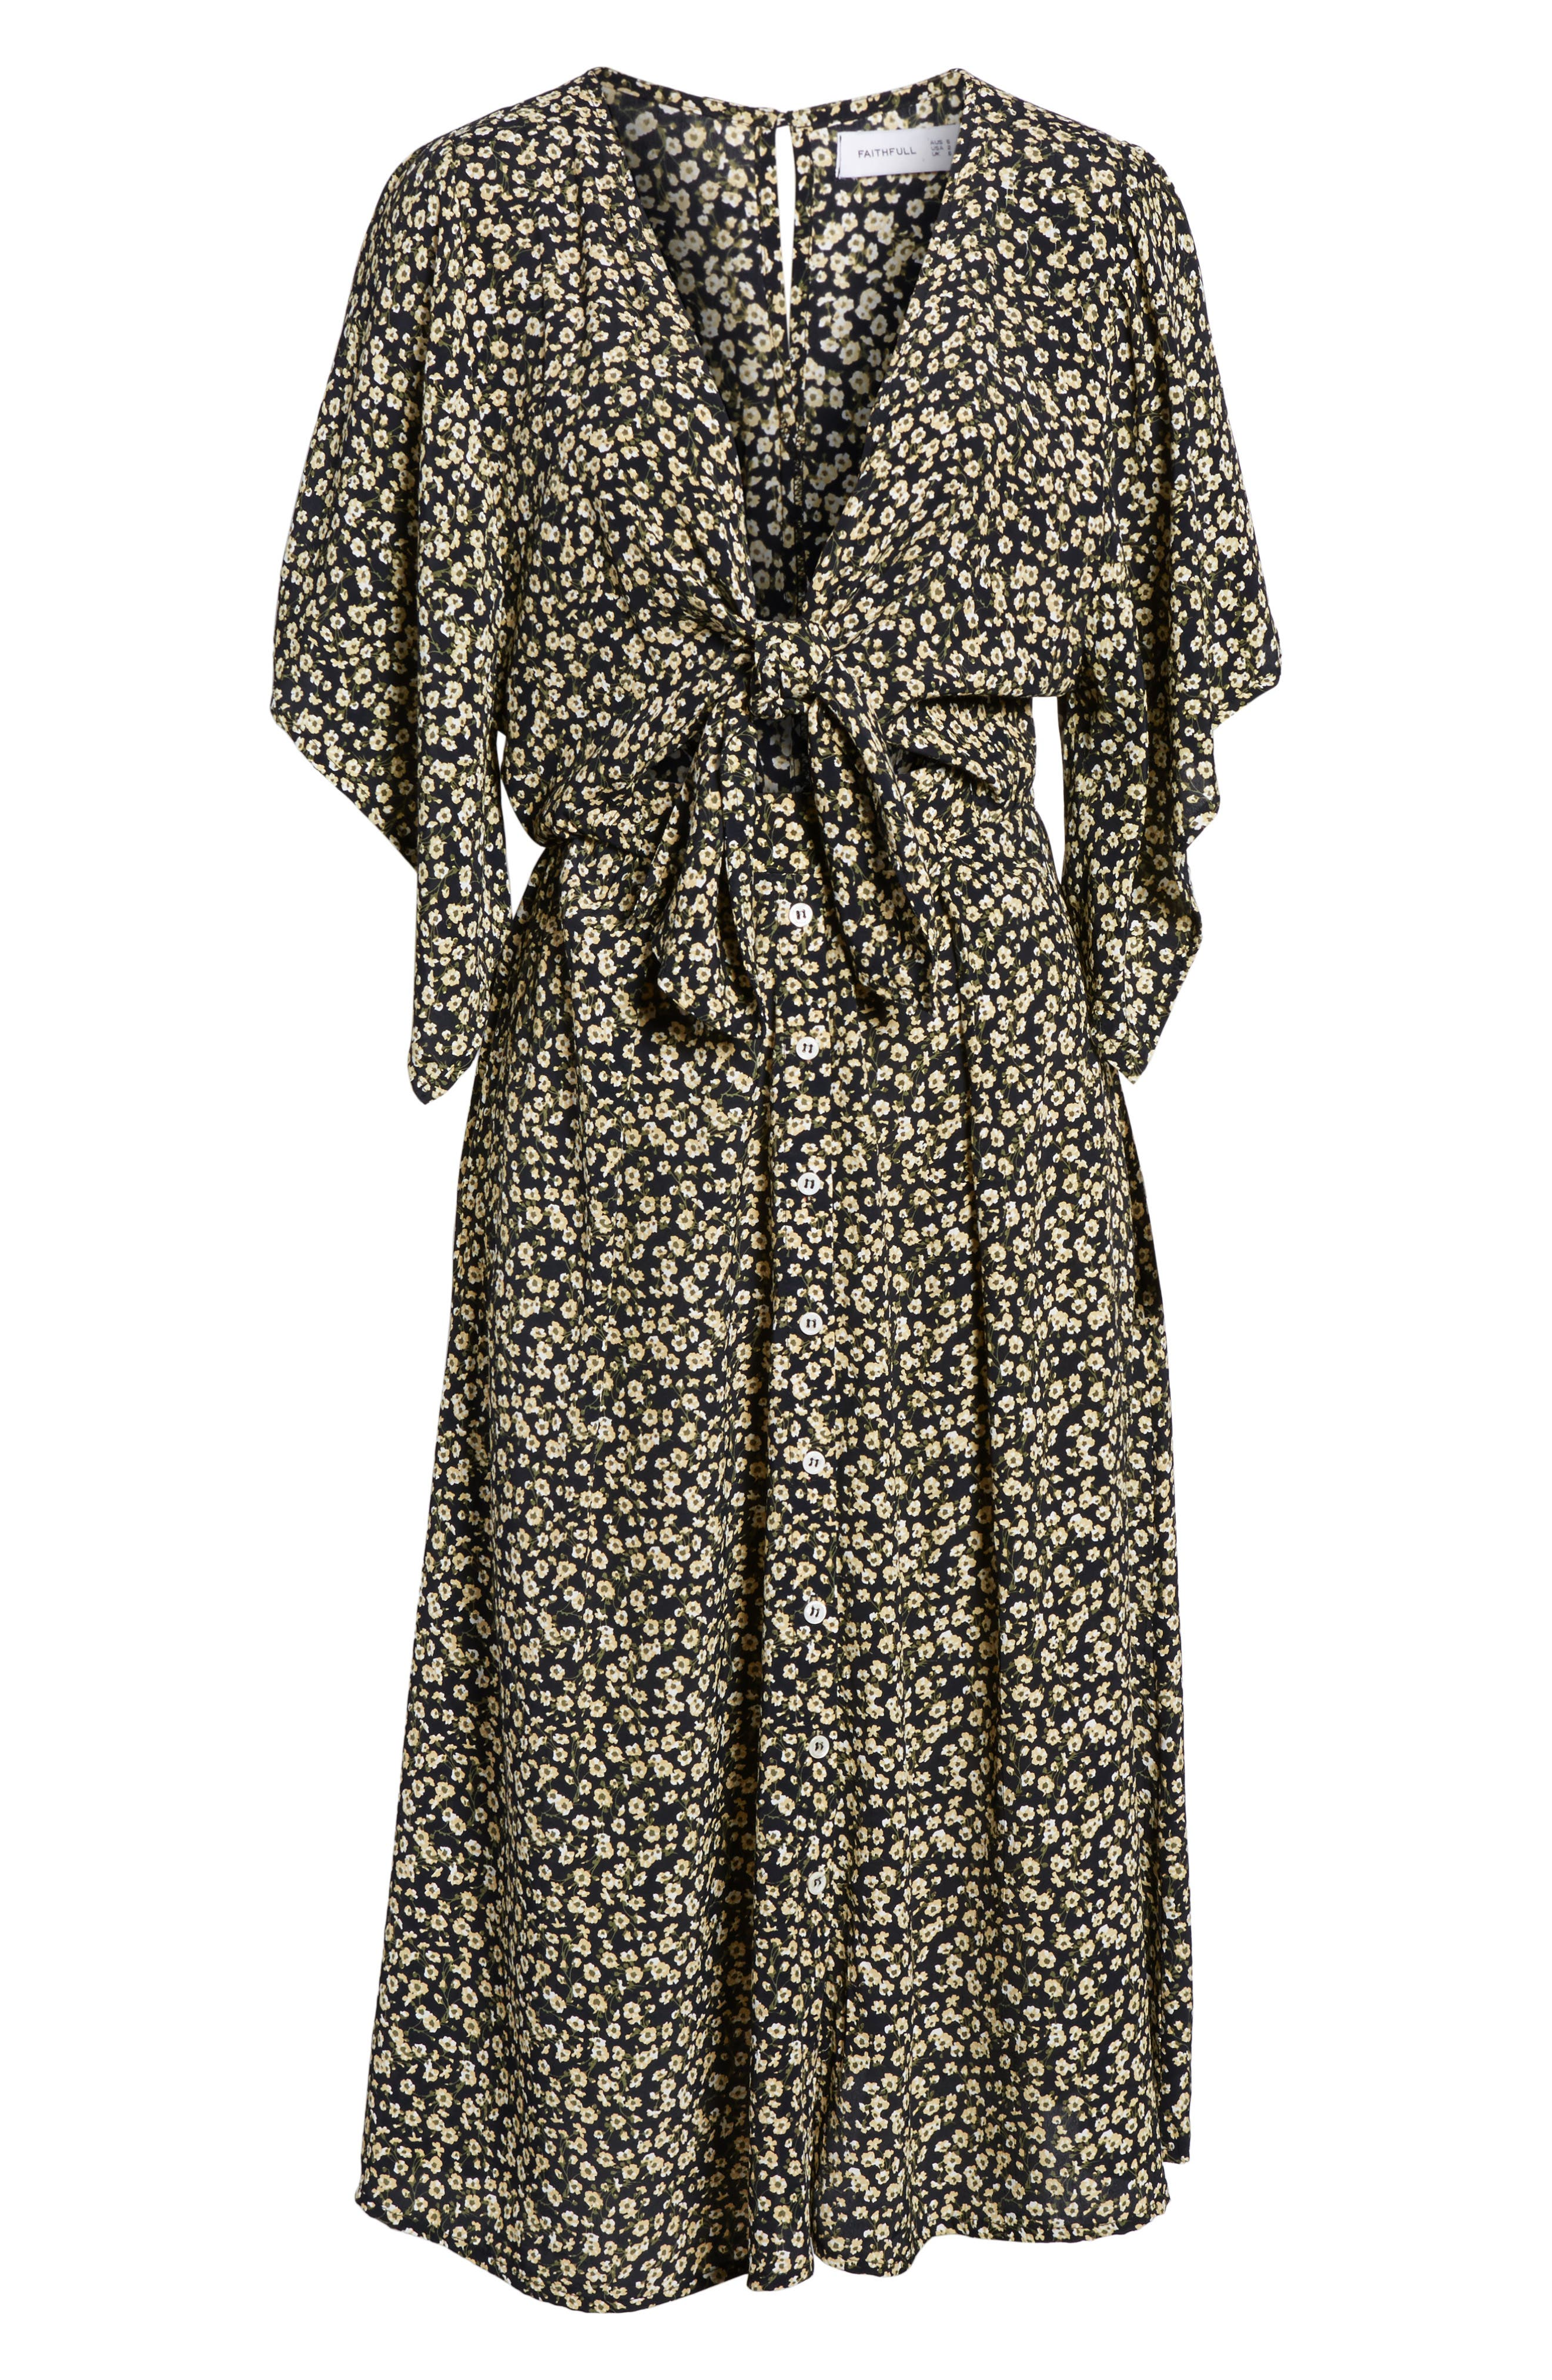 Massimo Tie Front Midi Dress,                             Alternate thumbnail 6, color,                             700